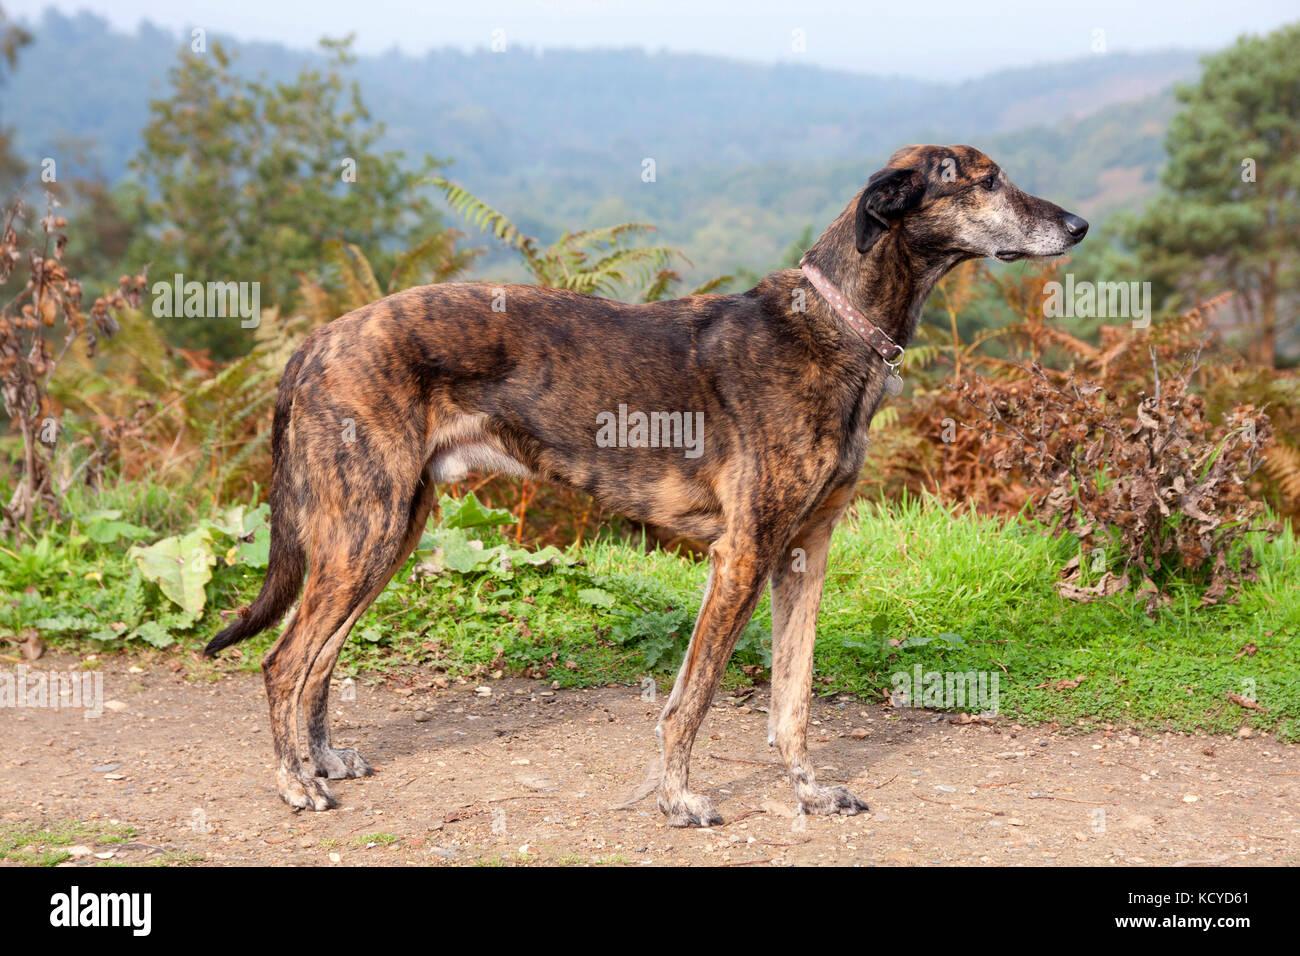 lurcher, brindle dog mature adult, standing above Devils Punchbowl, Surrey, England - Stock Image